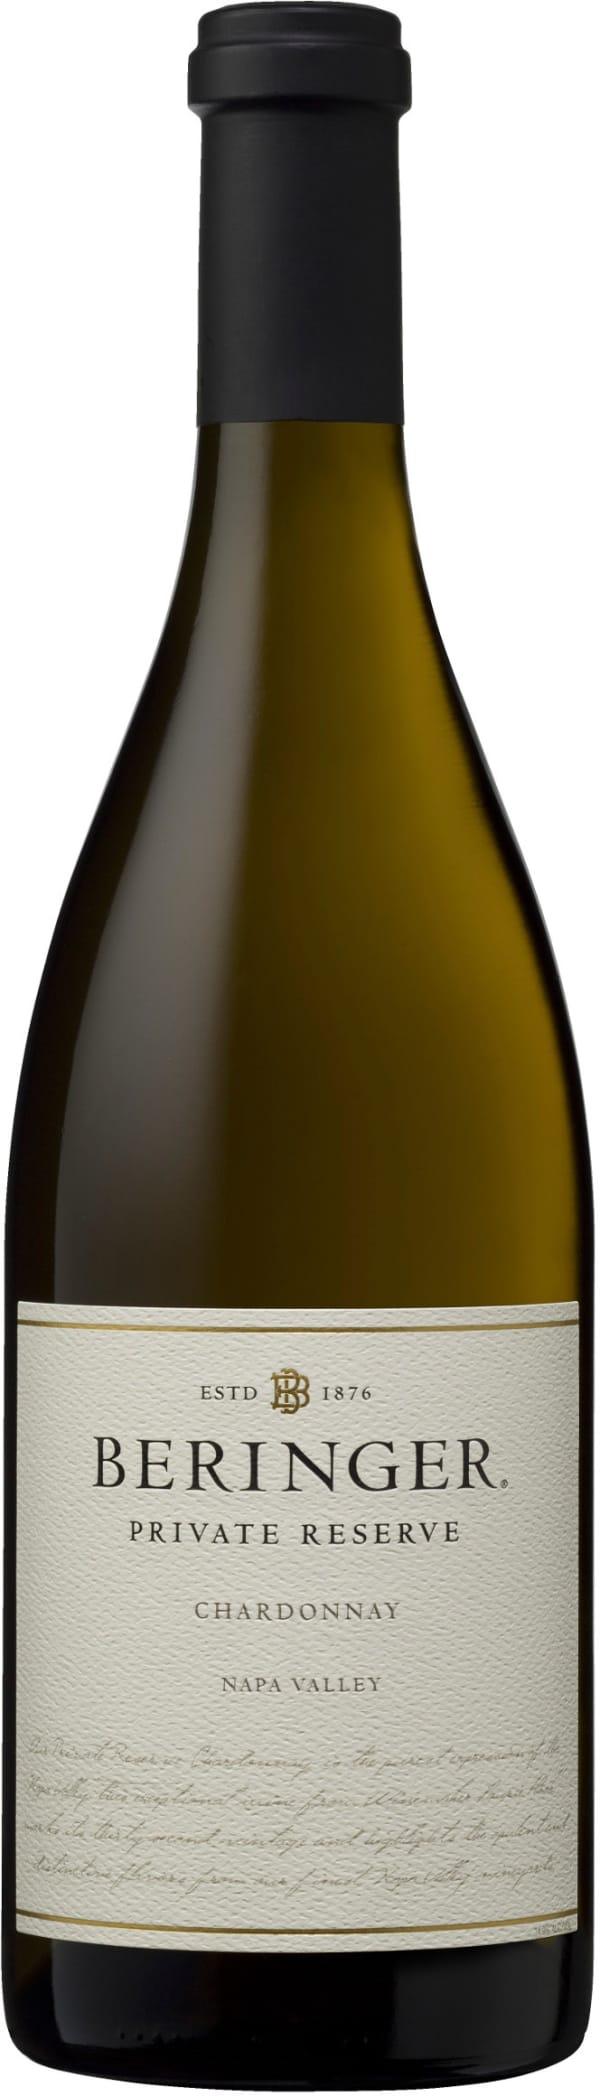 Beringer Private Reserve Chardonnay 2013